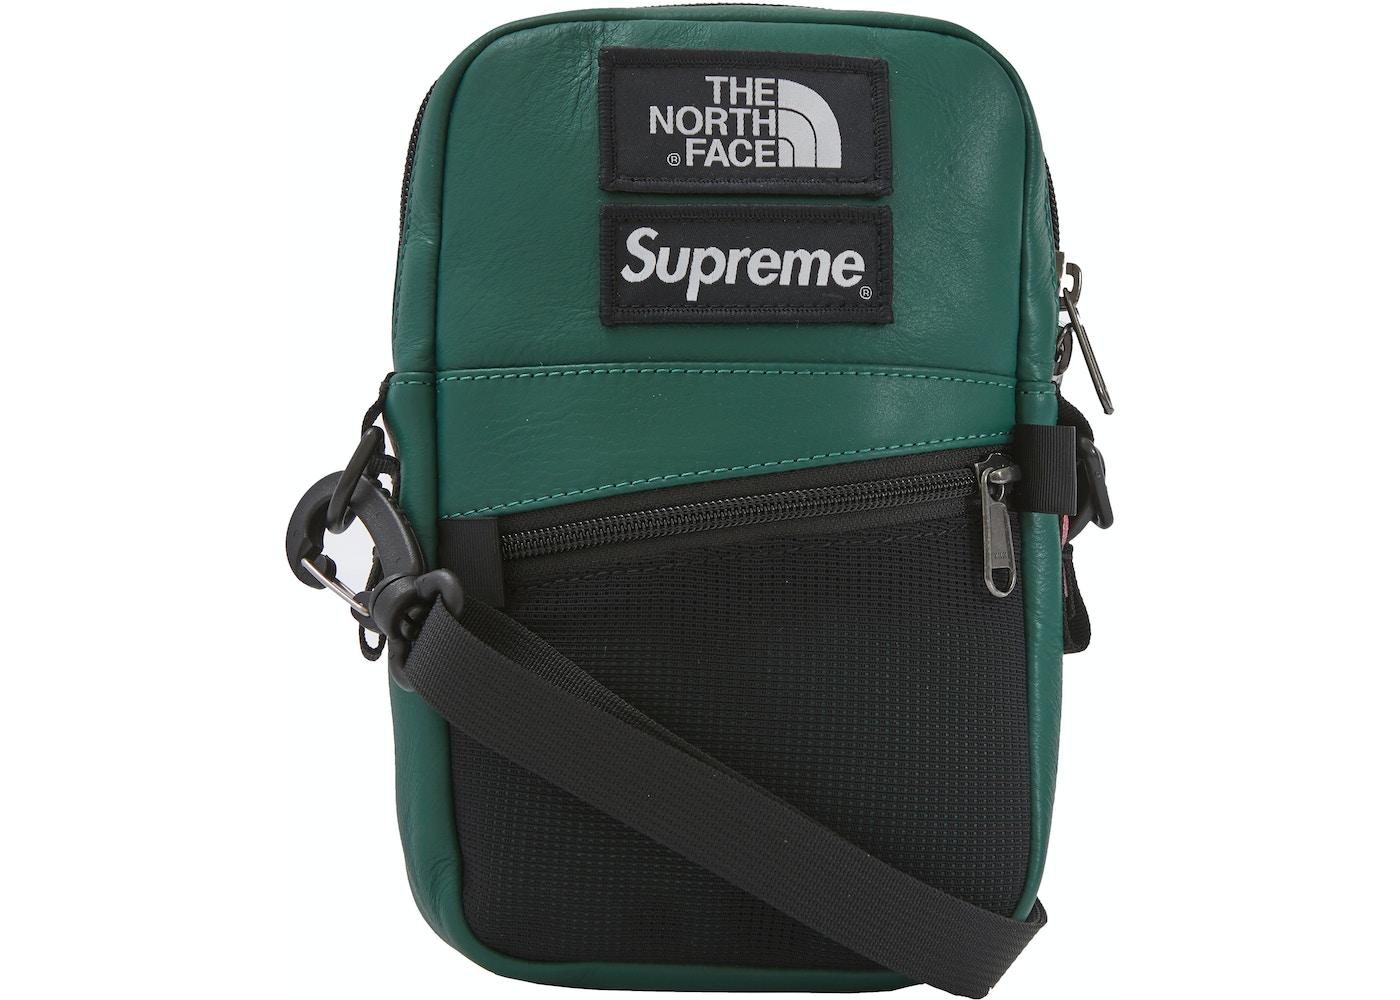 fa00d0f5324 Supreme The North Face Leather Shoulder Bag Dark Green - FW18